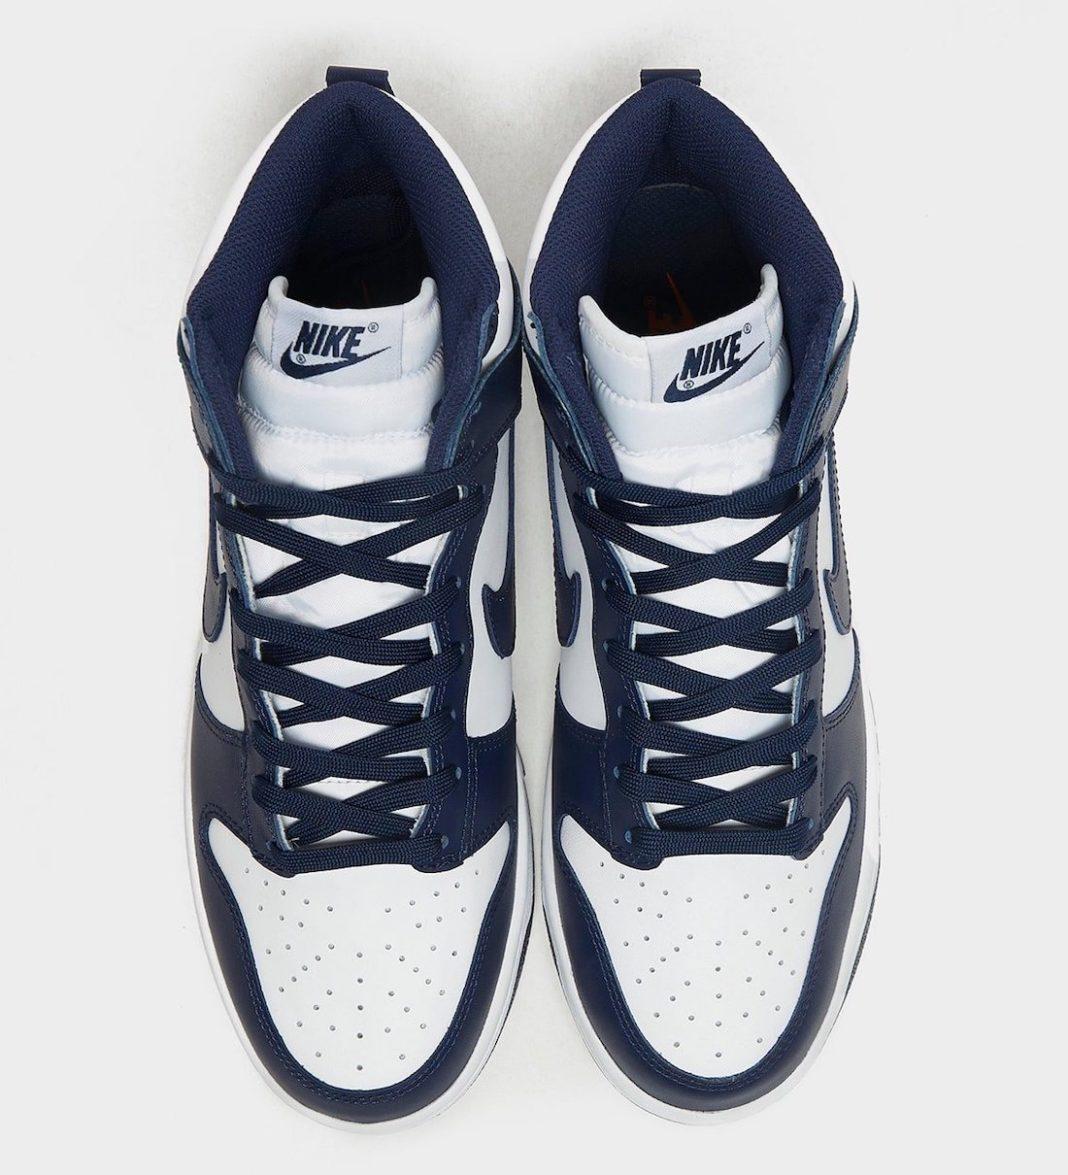 Dunk,Nike,发售  好看还不贵!又一款 OG 配色 Dunk 回归!复刻实物曝光!